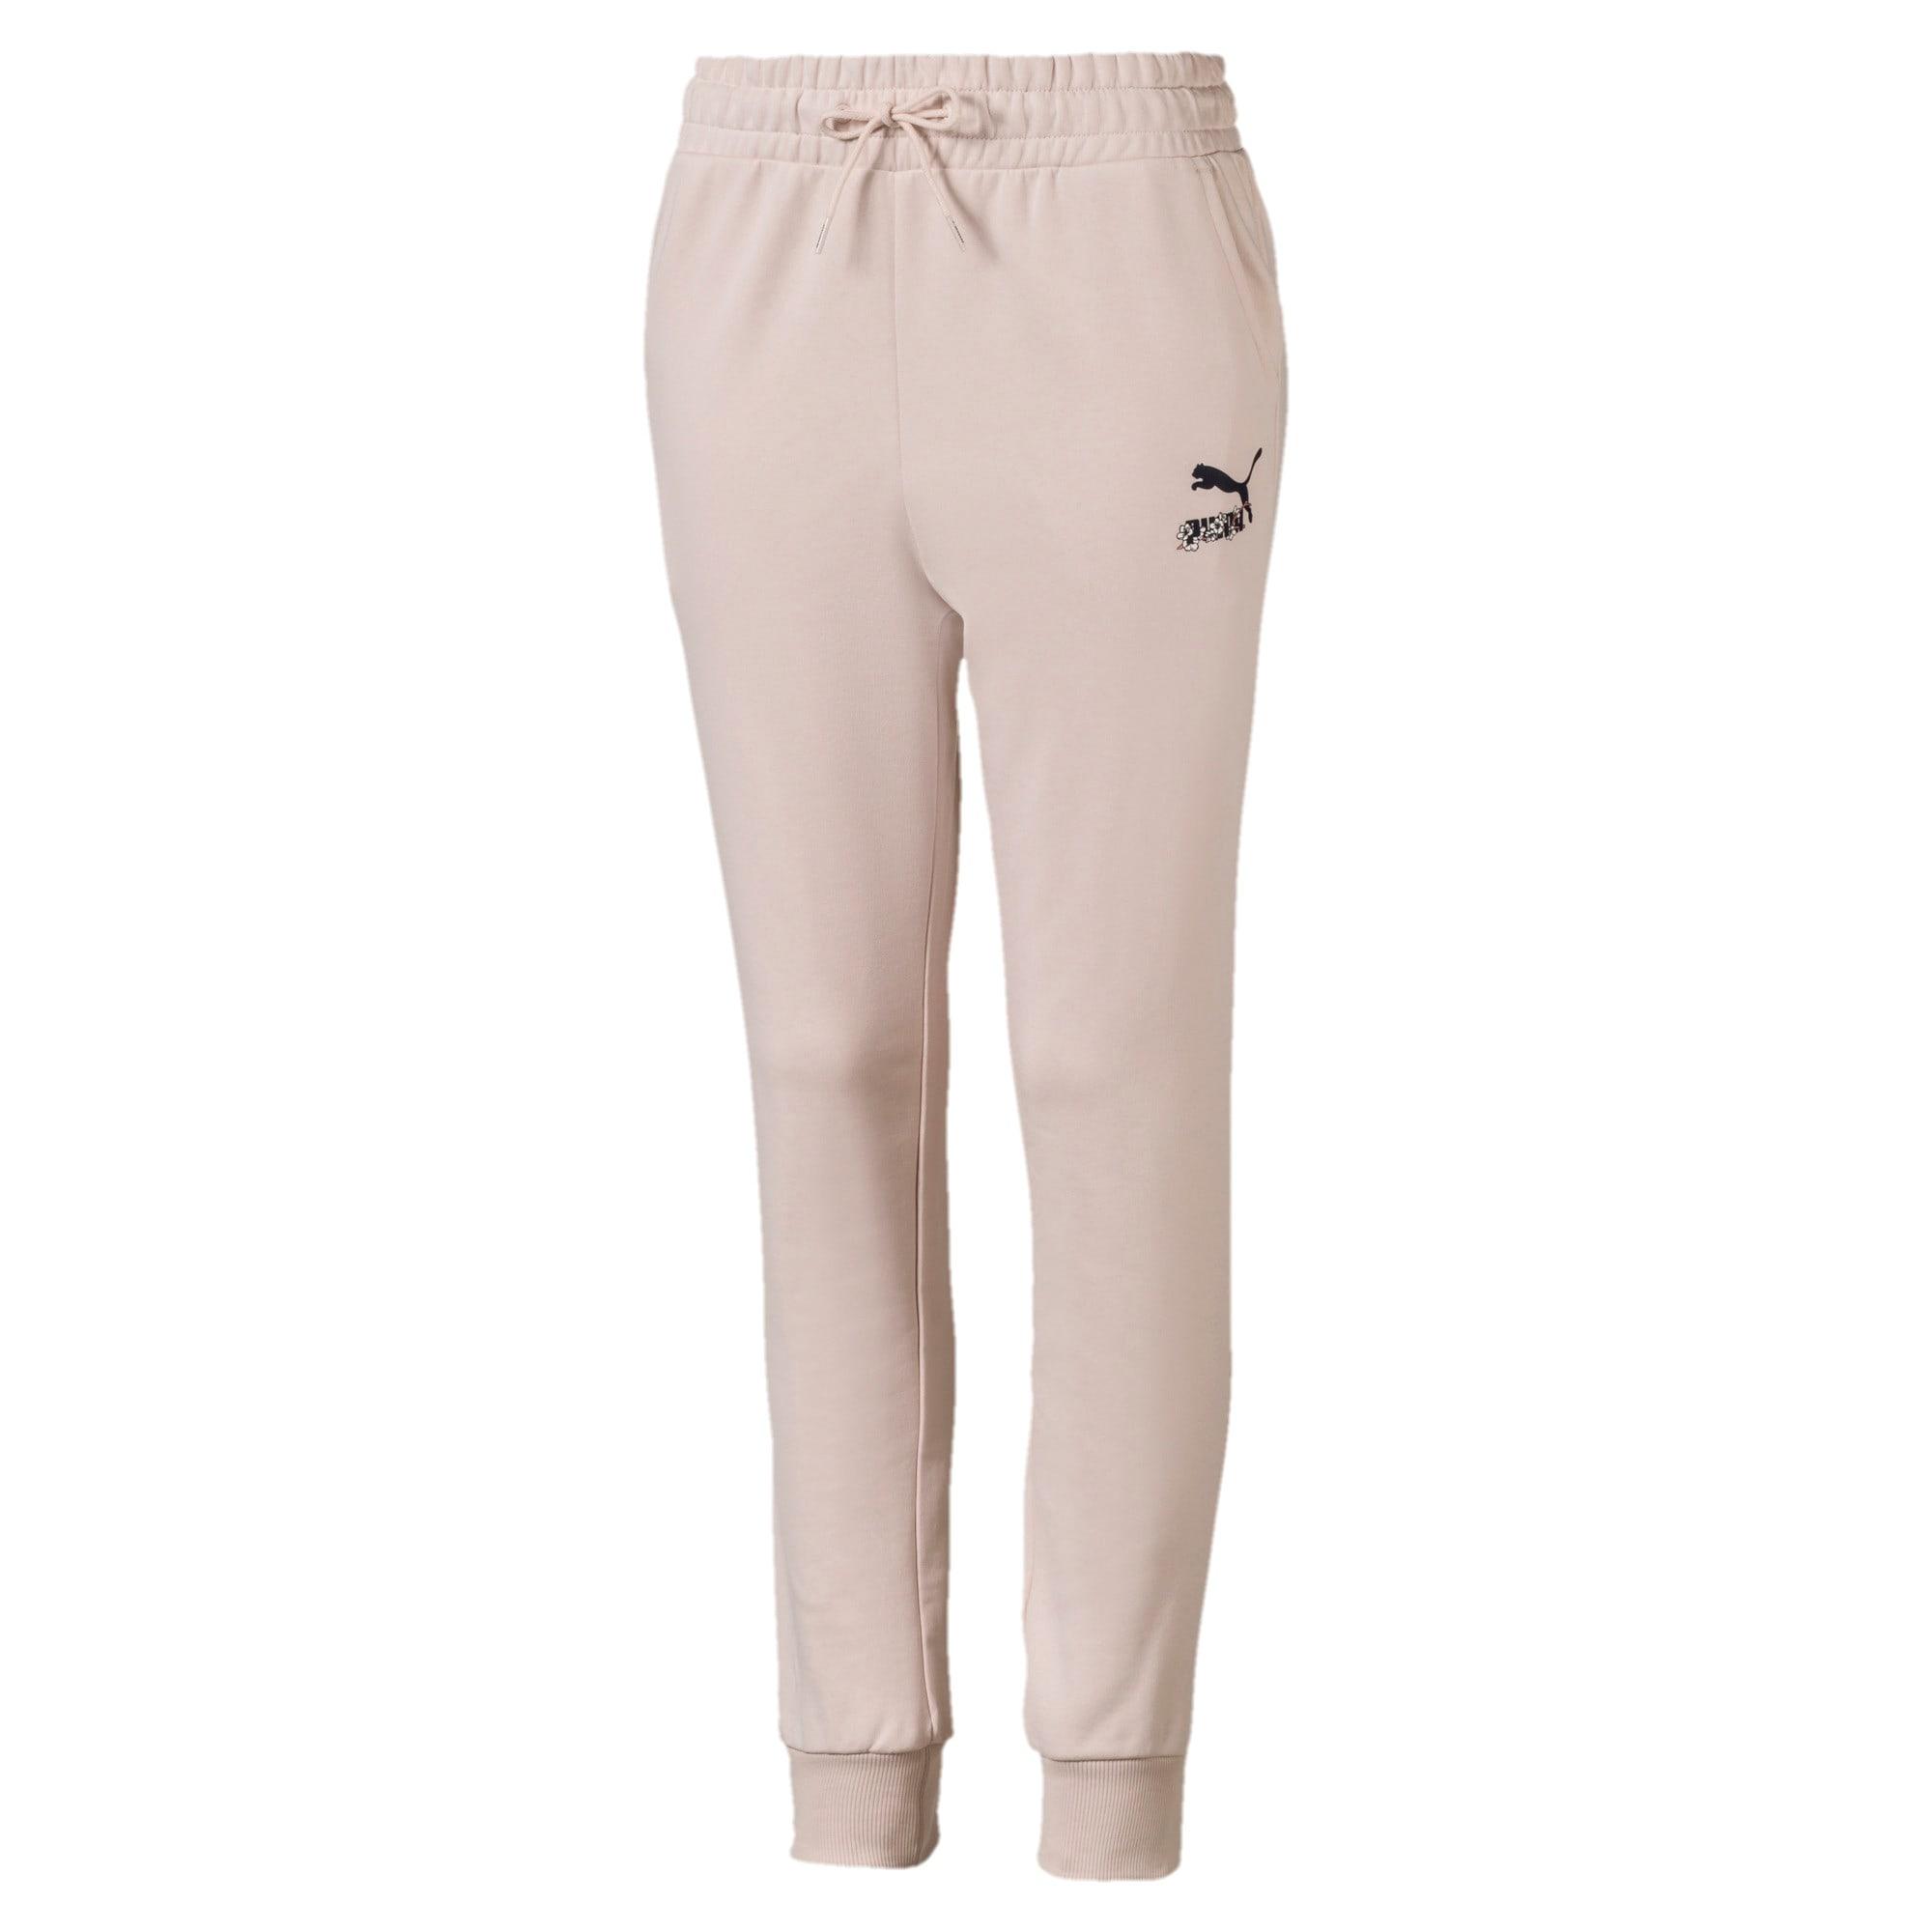 Miniatura 1 de Pantalones deportivosSakurapara mujer, Pastel Parchment, mediano